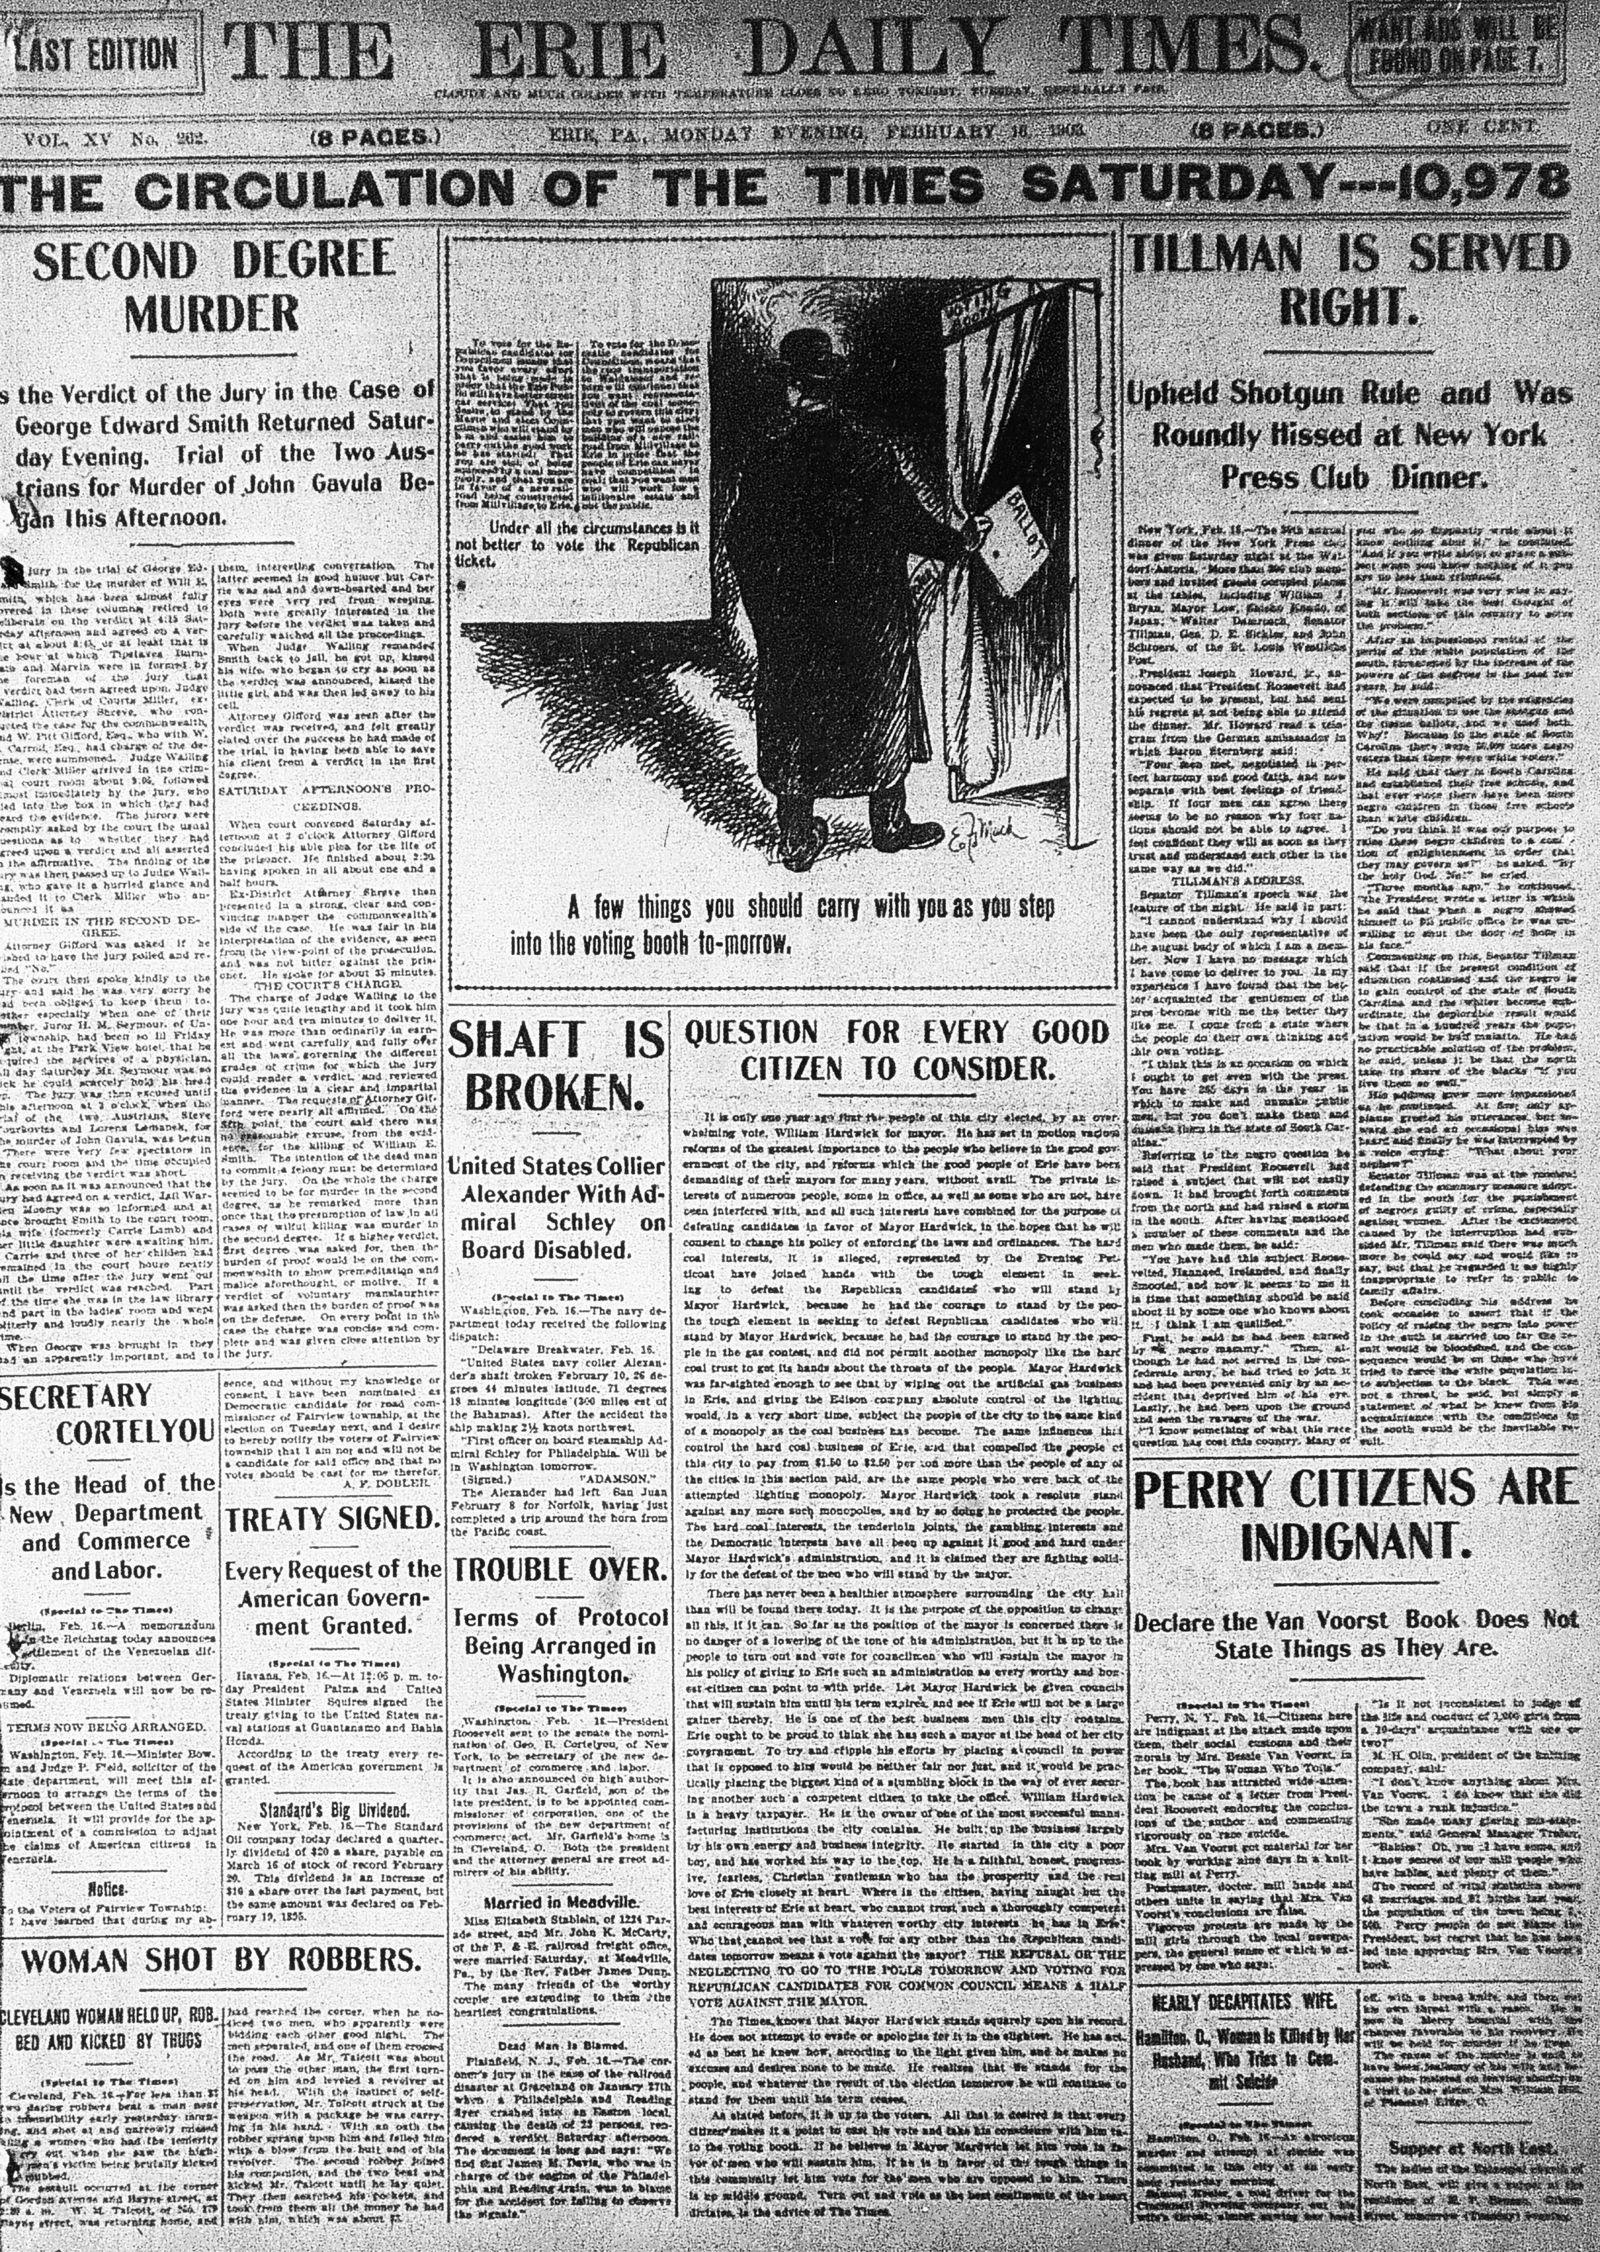 Feb. 15, 1903 Newspaper cover, edwards, The verdict